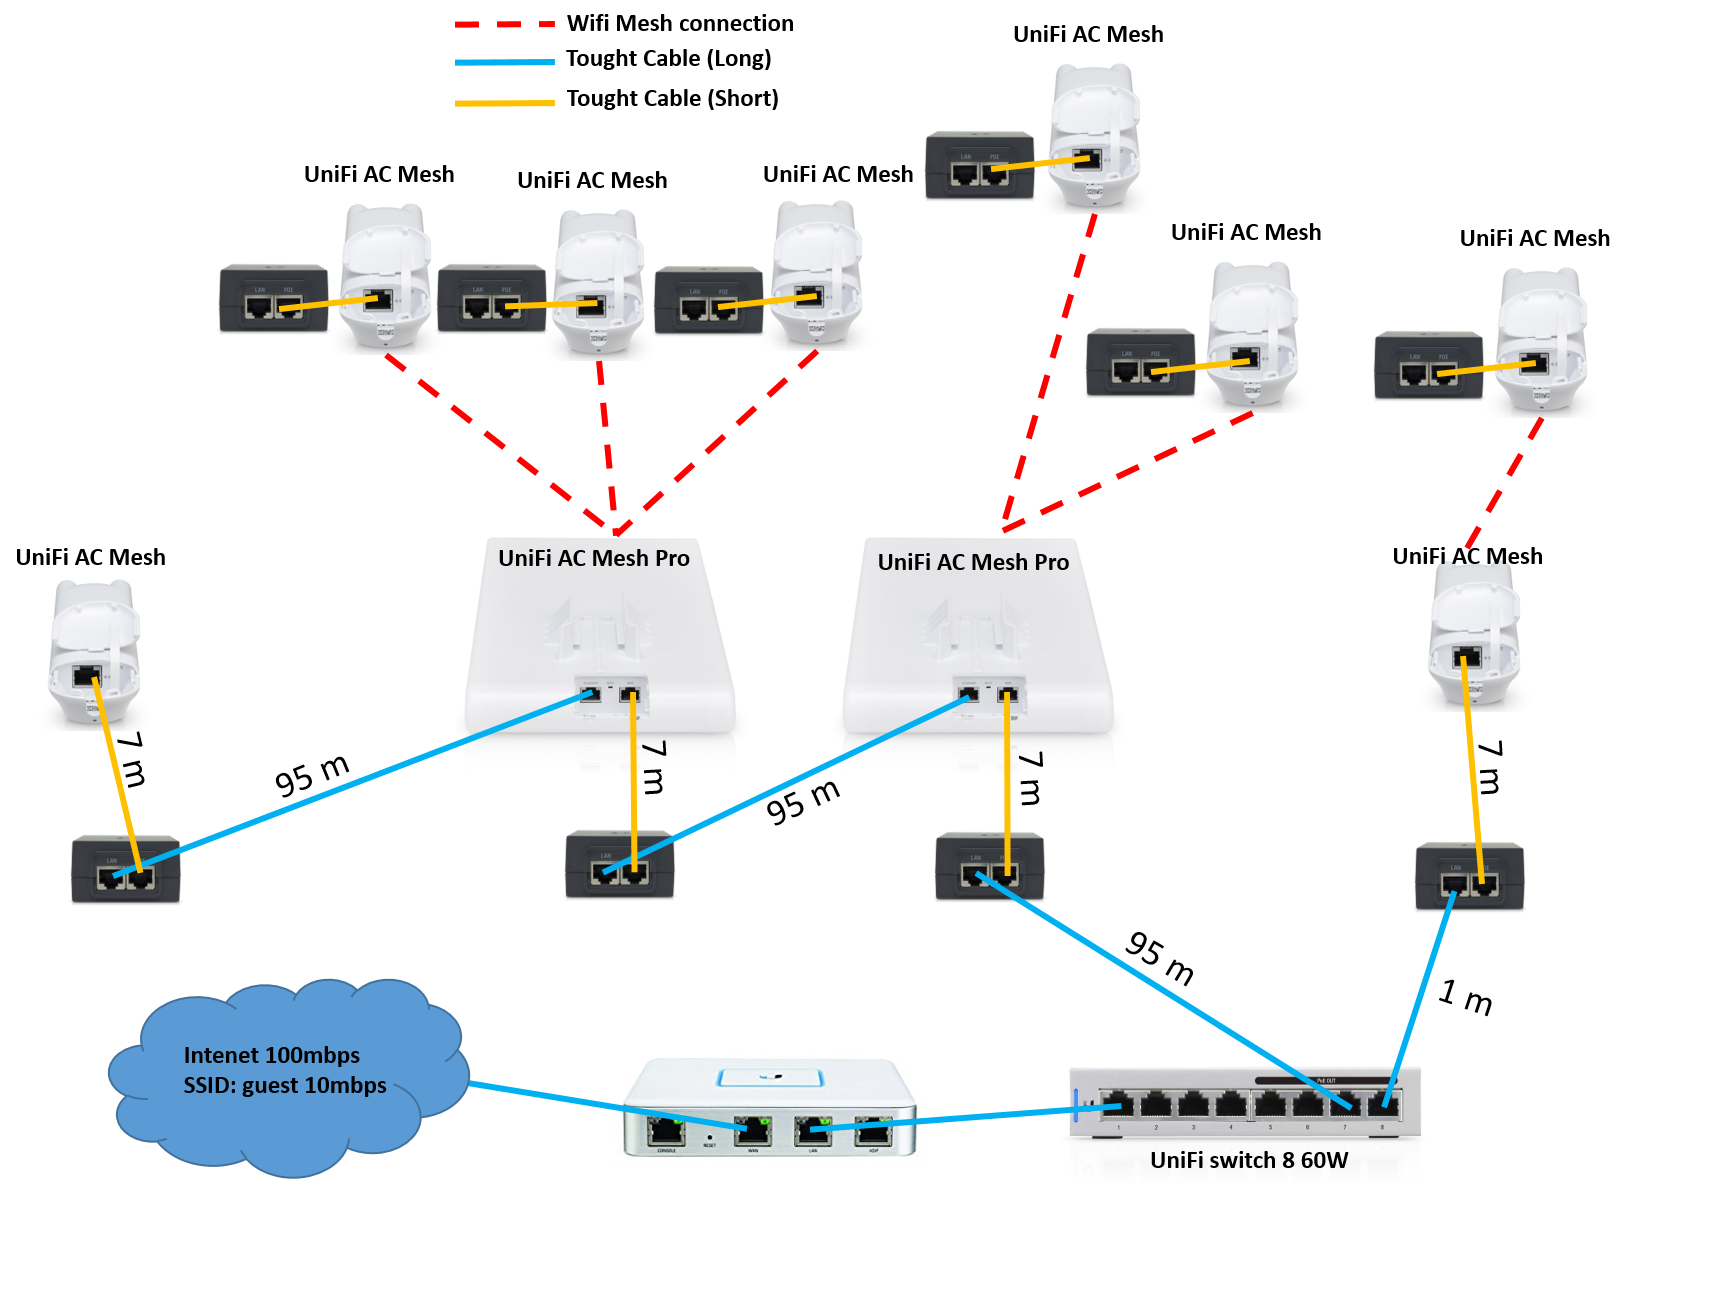 ubiquiti wiring diagram camping layout  wifi wired  ubiquiti community  camping layout  wifi wired